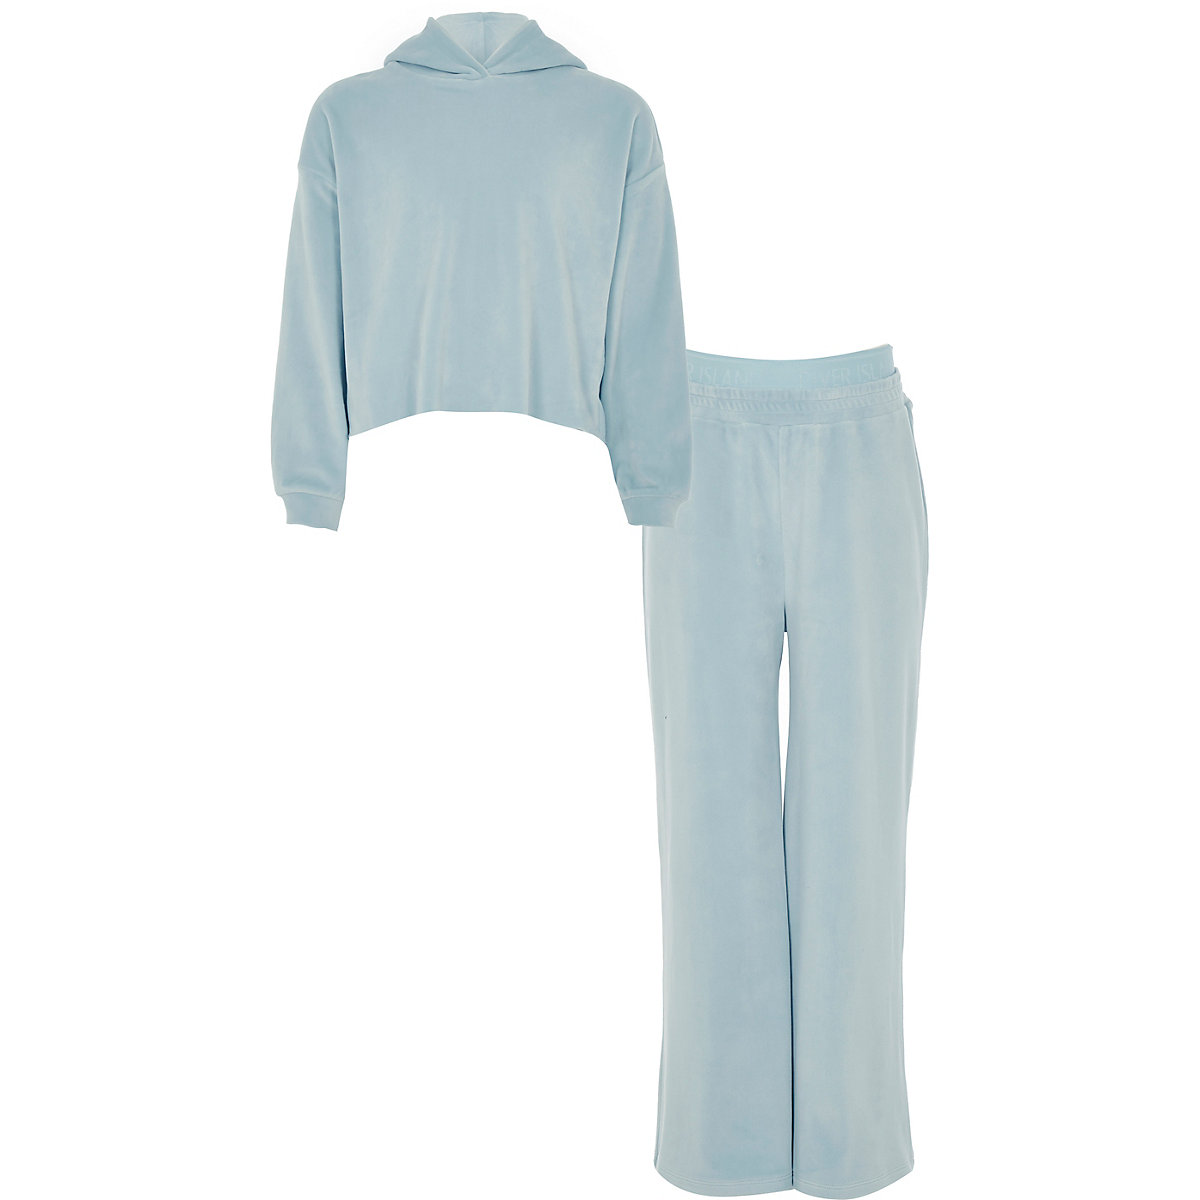 Girls light blue velour jogger outfit